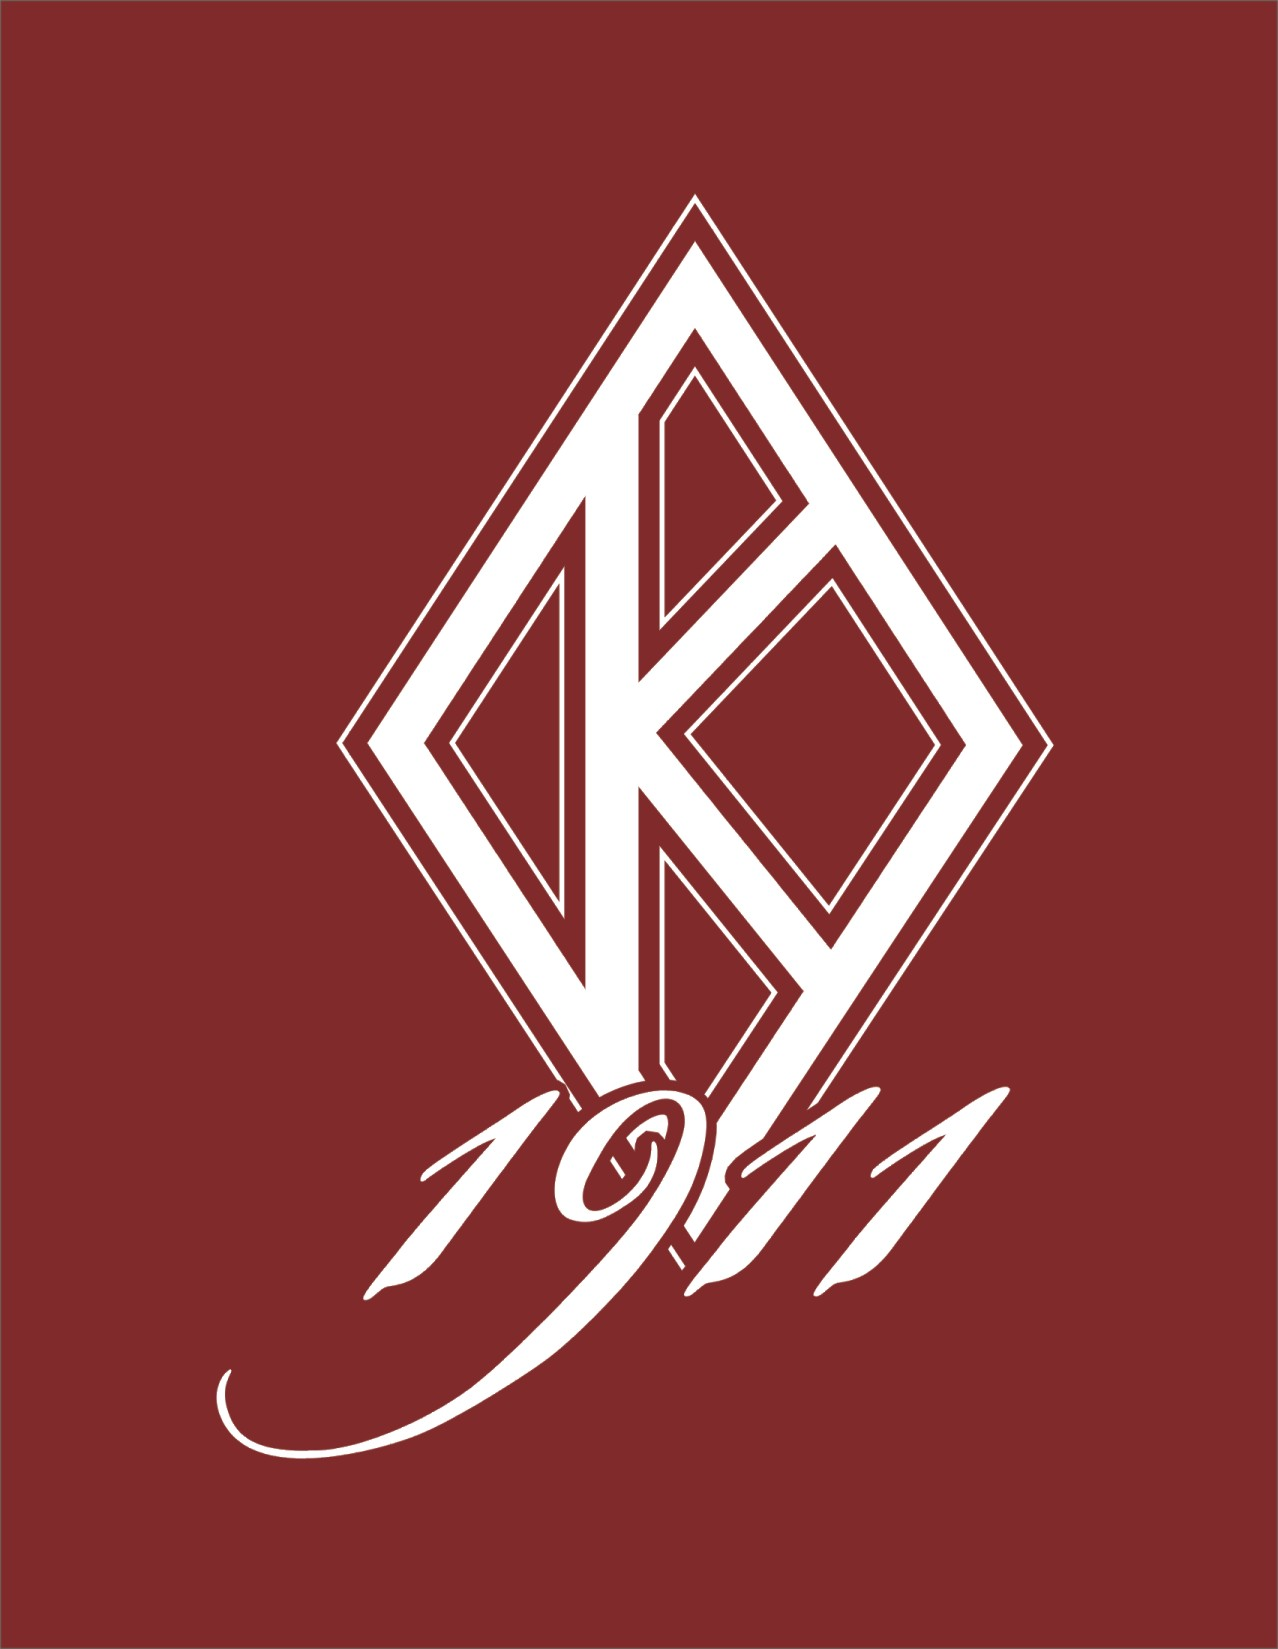 KRIMSON_K_DIAMOND_1911-2_original.JPG